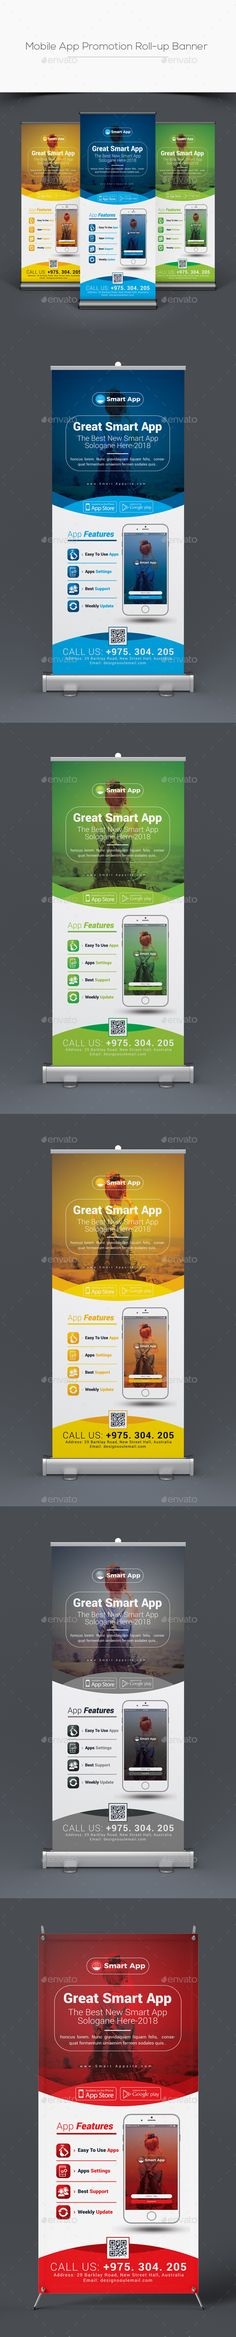 #Mobile #App Promotion Roll-up Banner